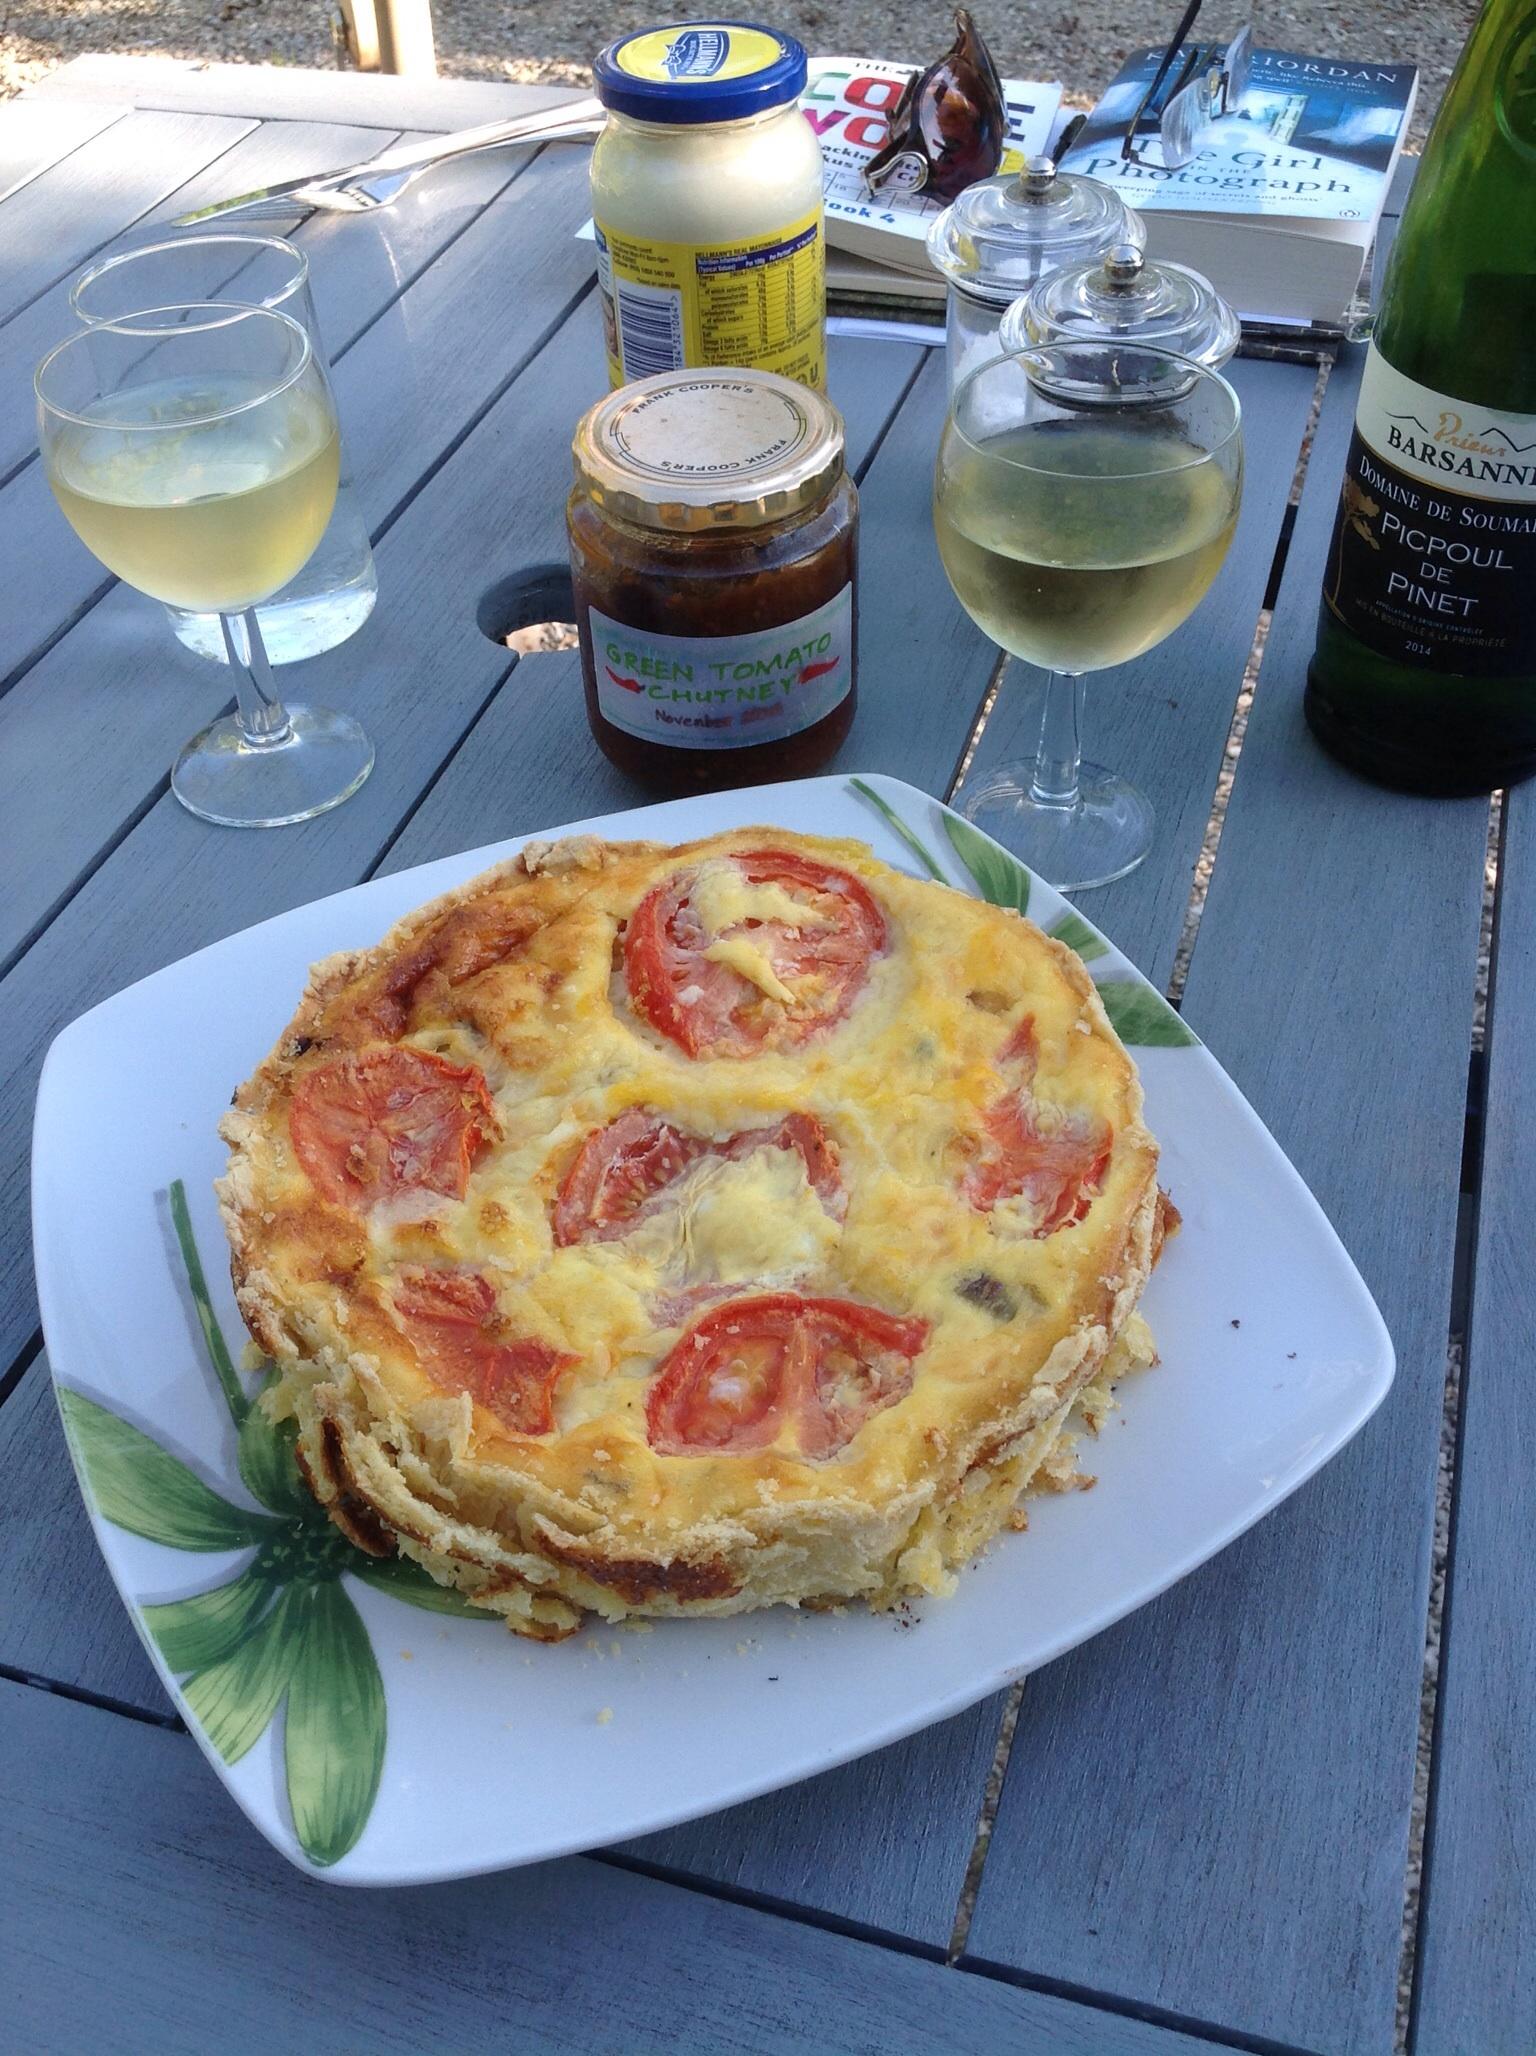 Deep, satisfying and full of tasty goodness... just like Jayne!